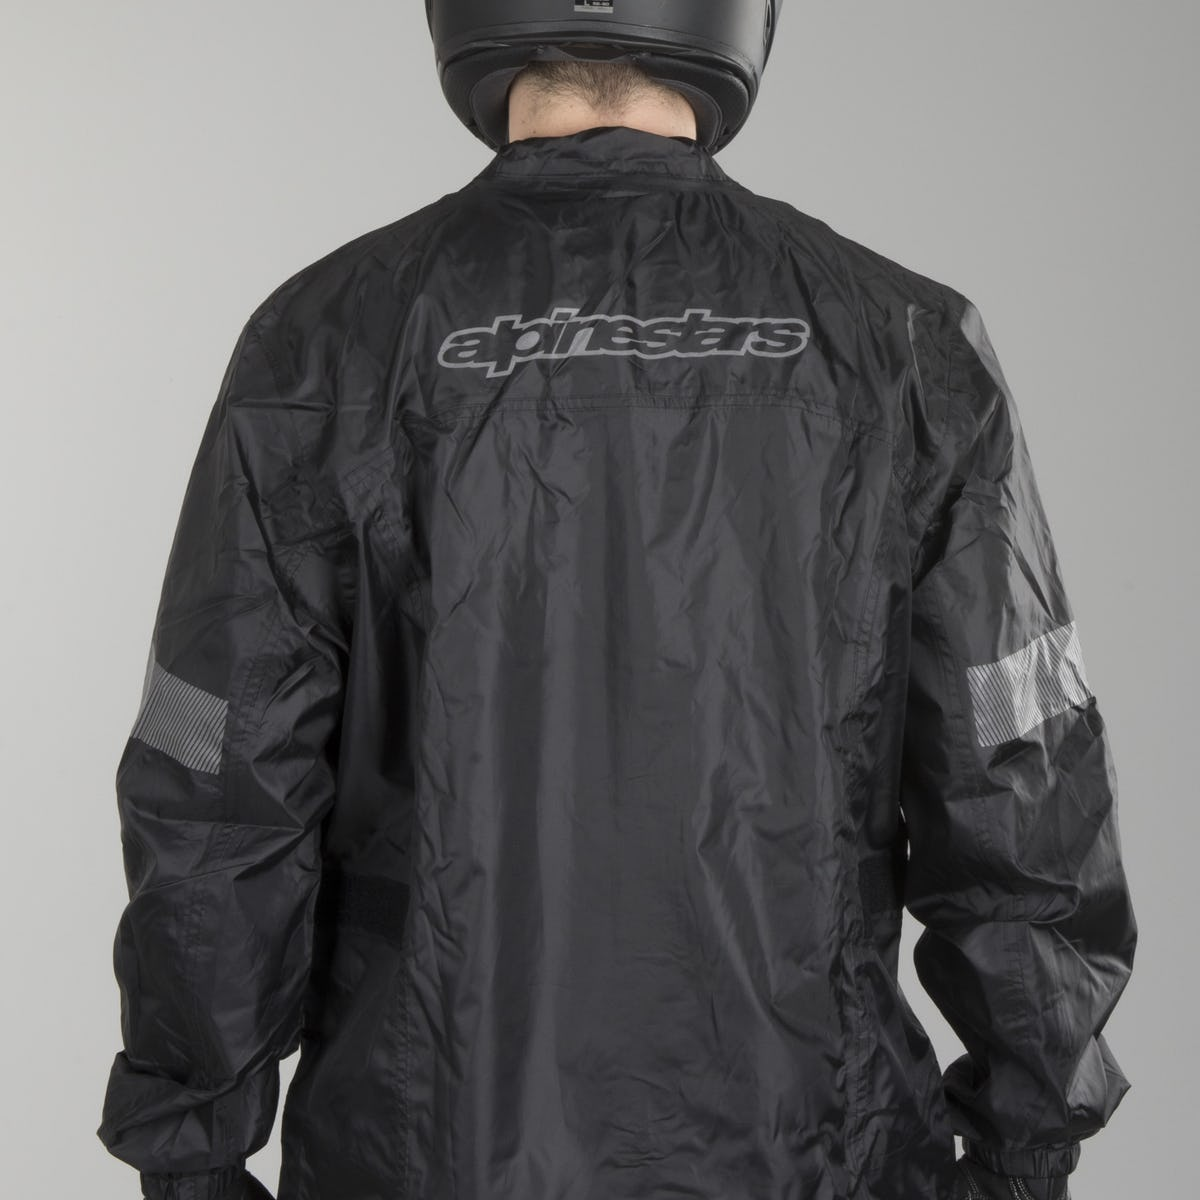 Jaqueta Alpinestars Hurricane Rain (Preto)  - Nova Suzuki Motos e Acessórios